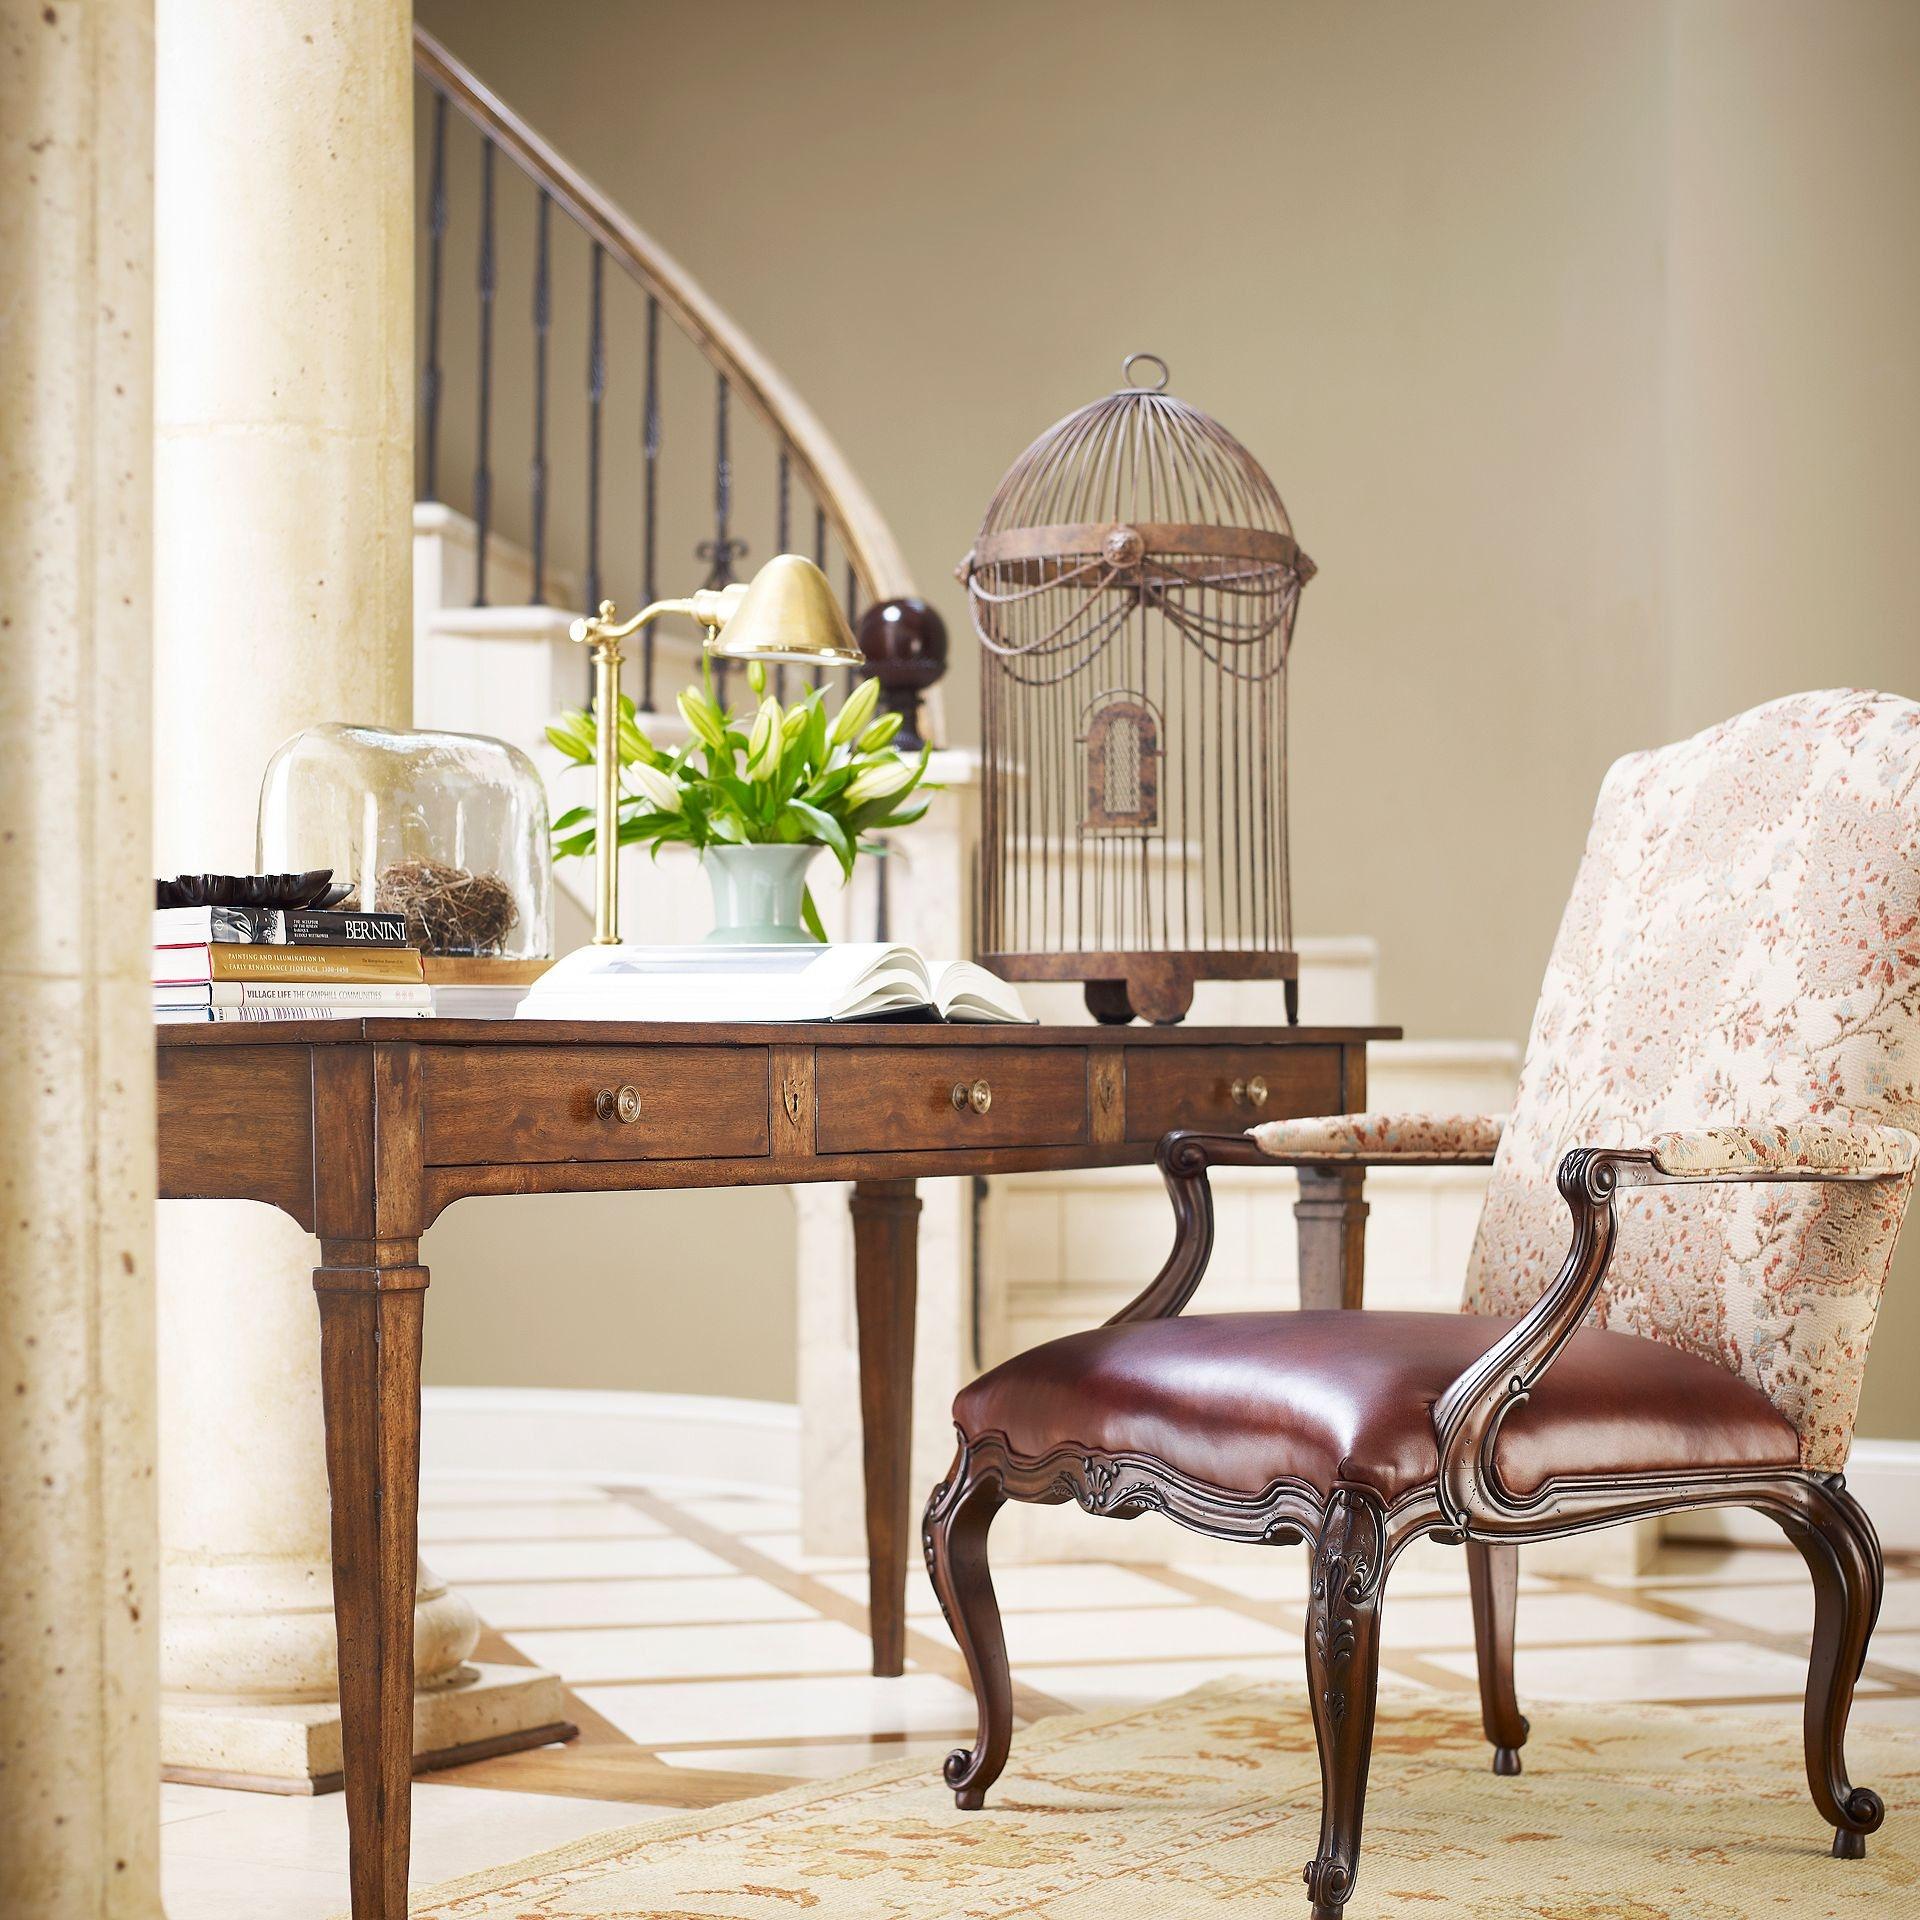 Henredon Furniture Acquisitions By Henredon Desk 3400 45